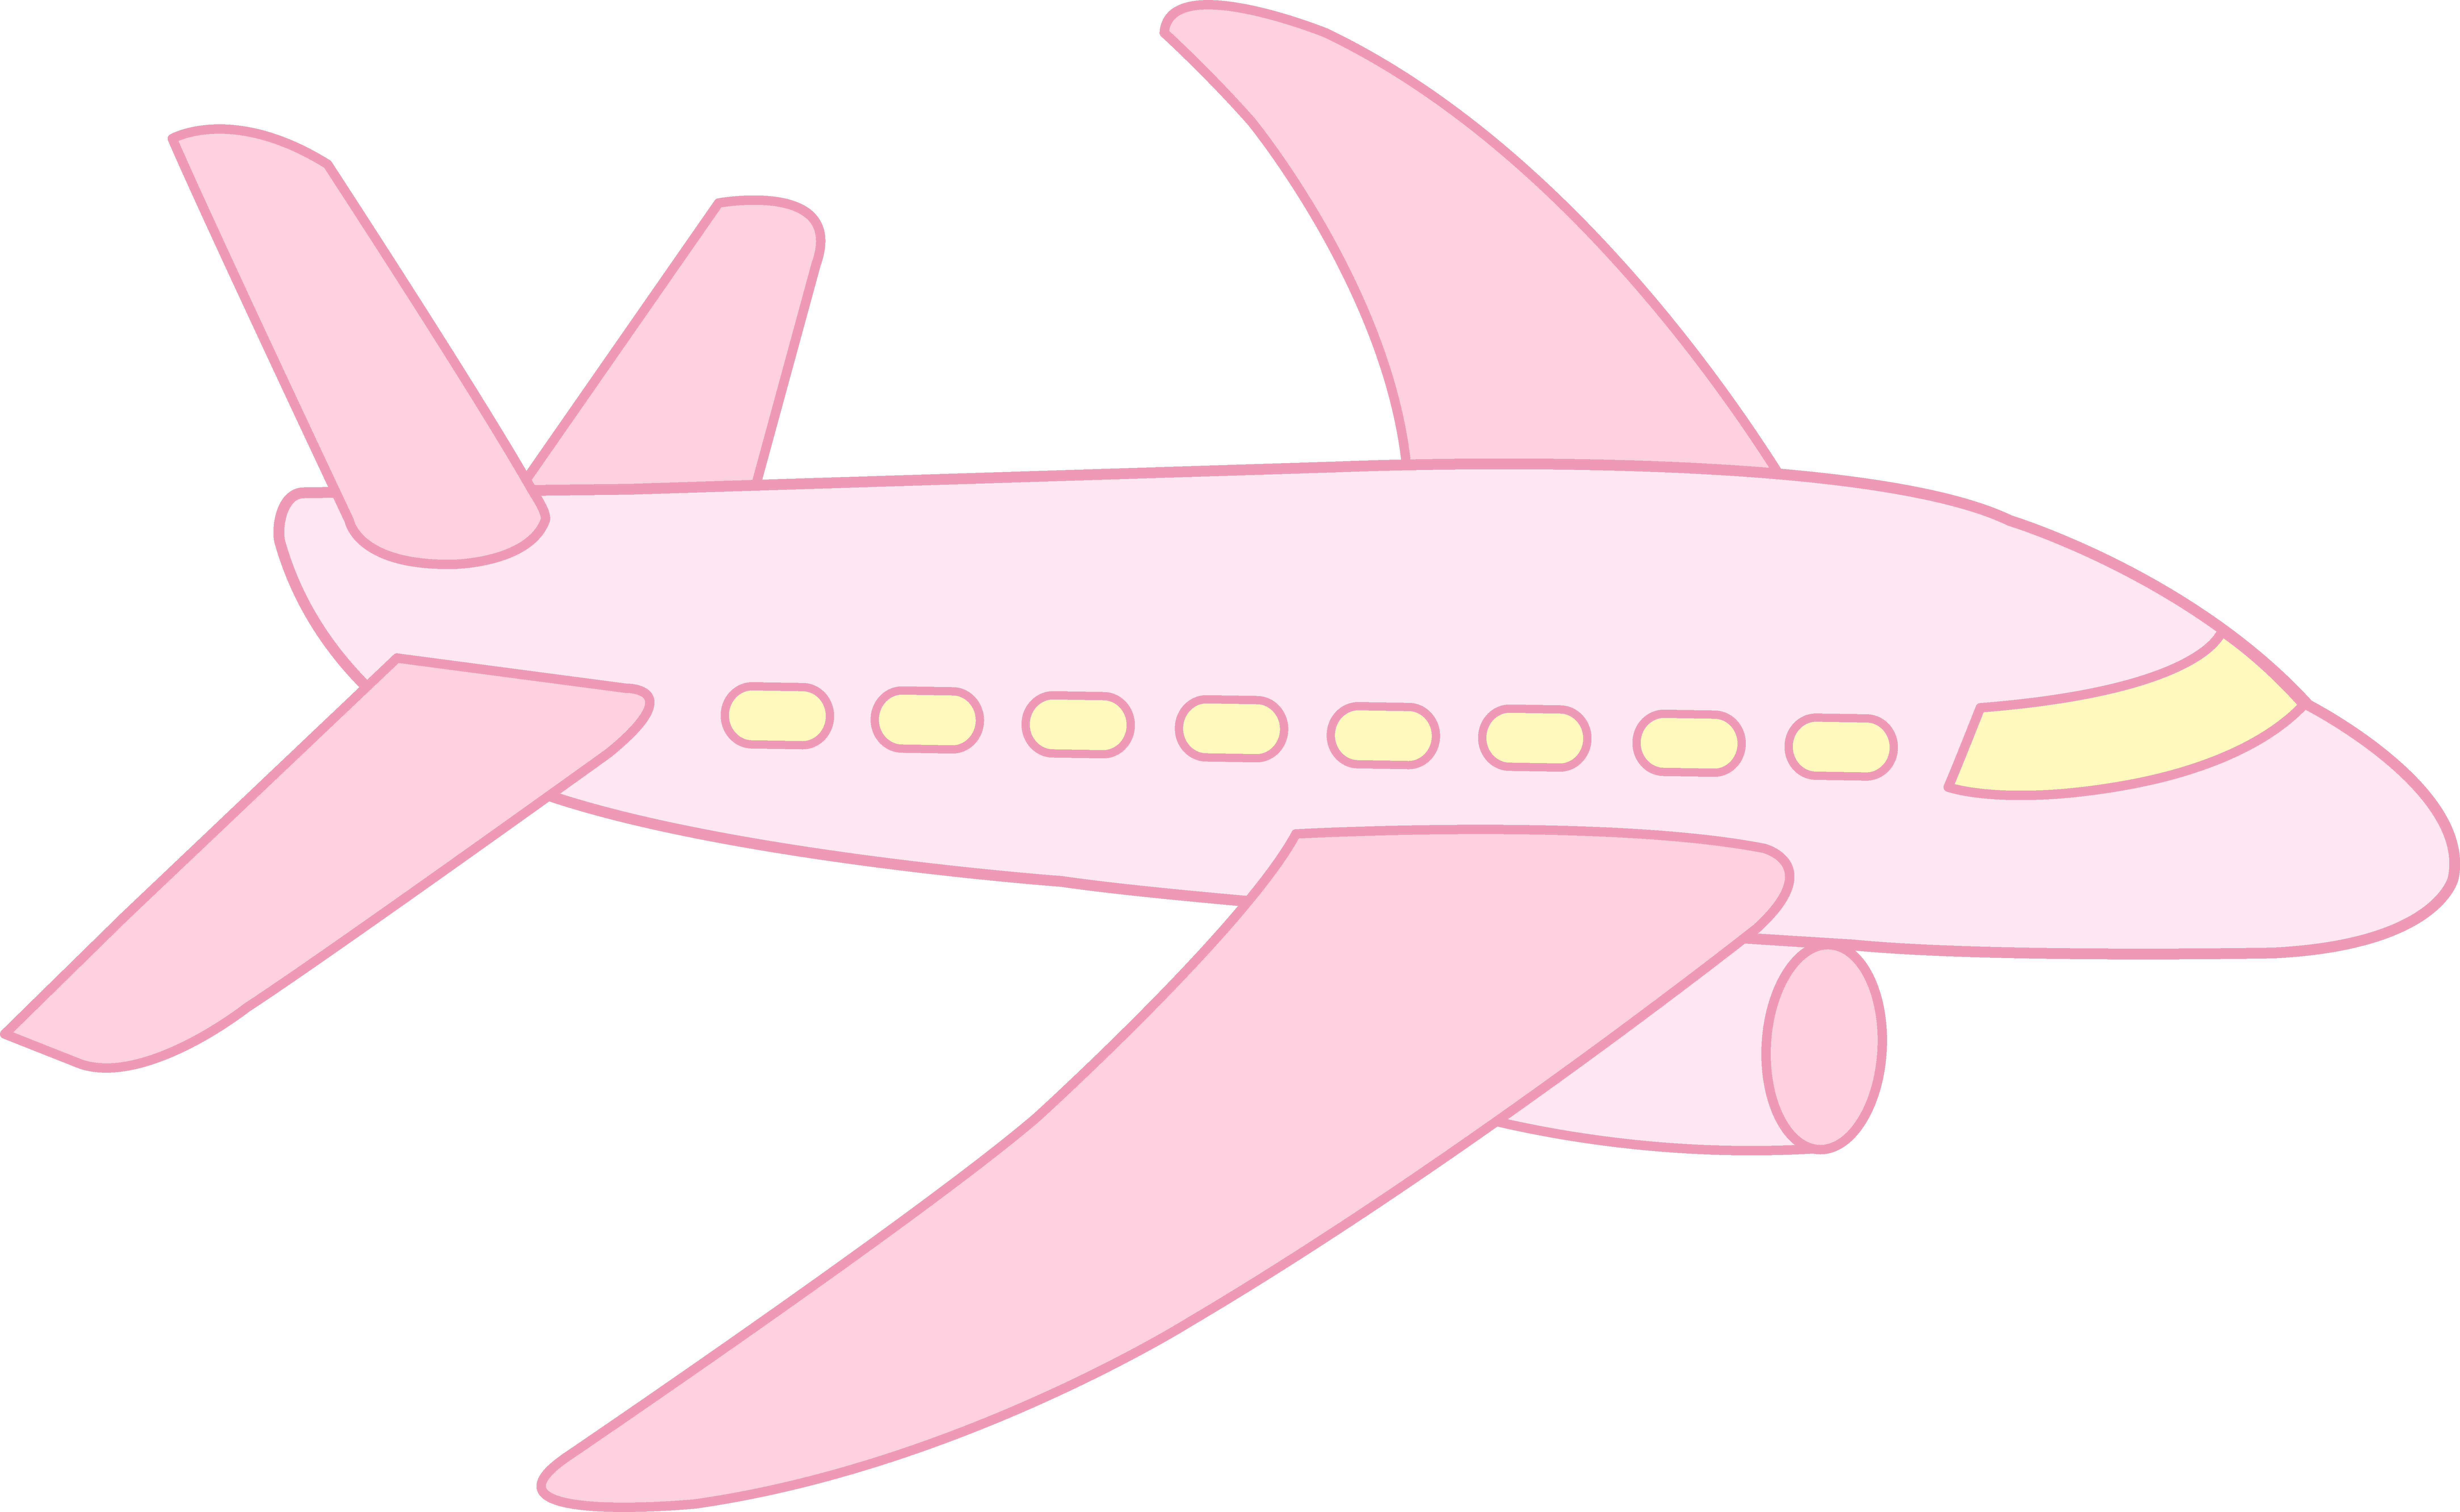 8669x5328 Cute Pink Airplane